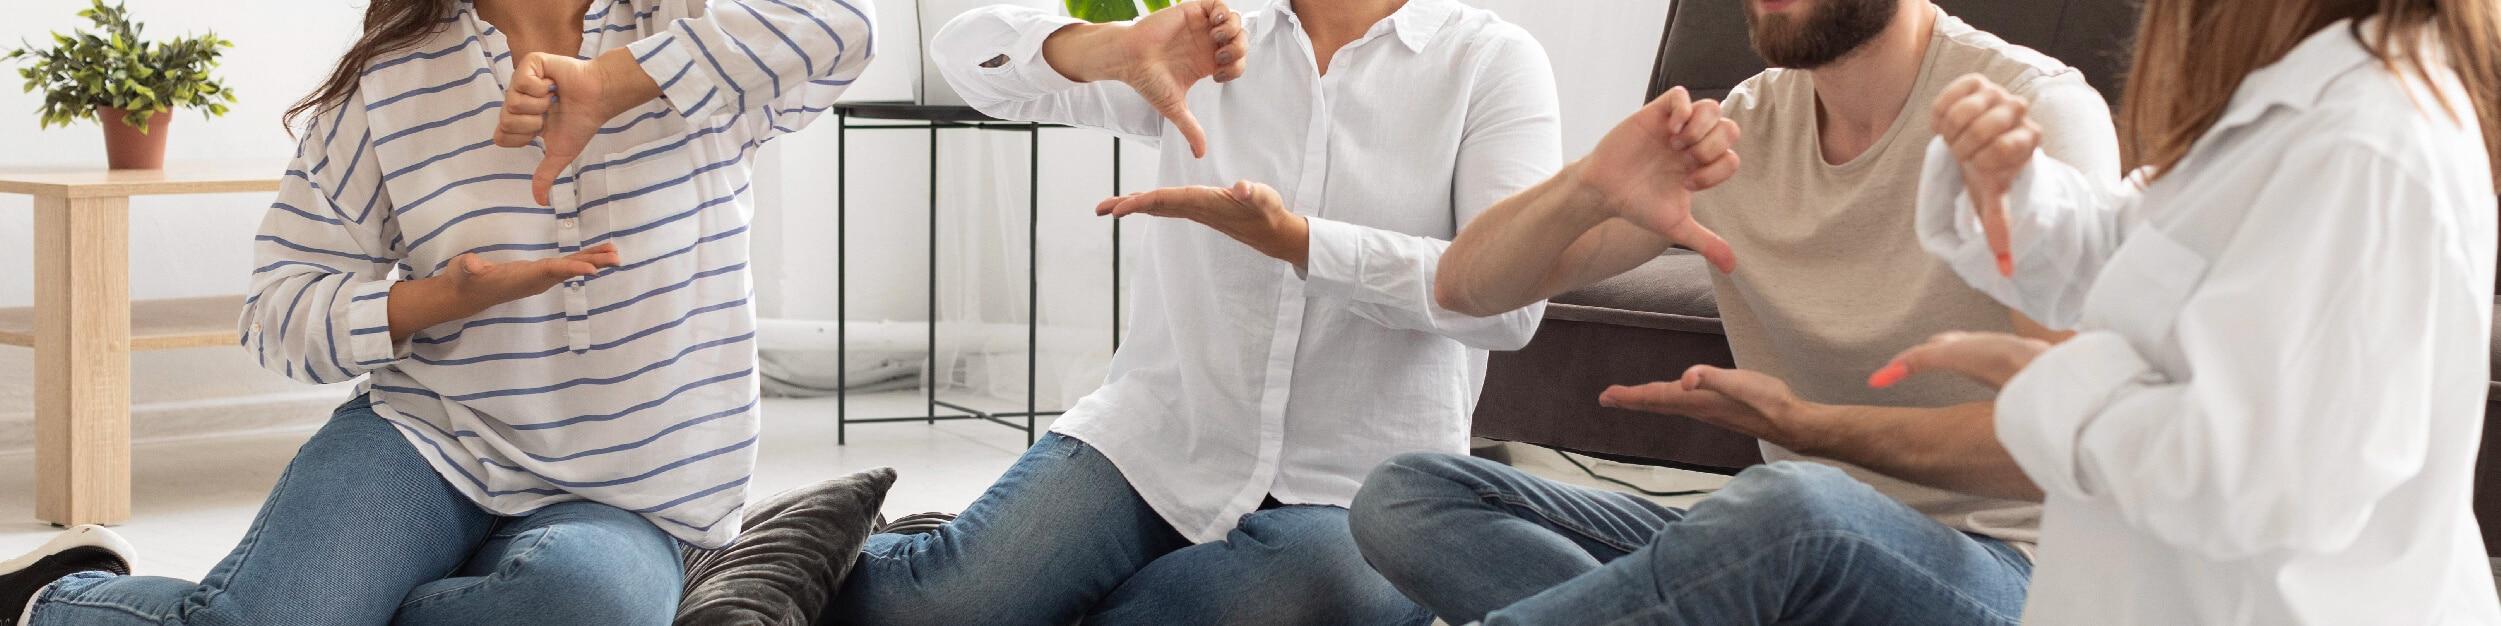 Curso Avanzado en Lengua de Señas